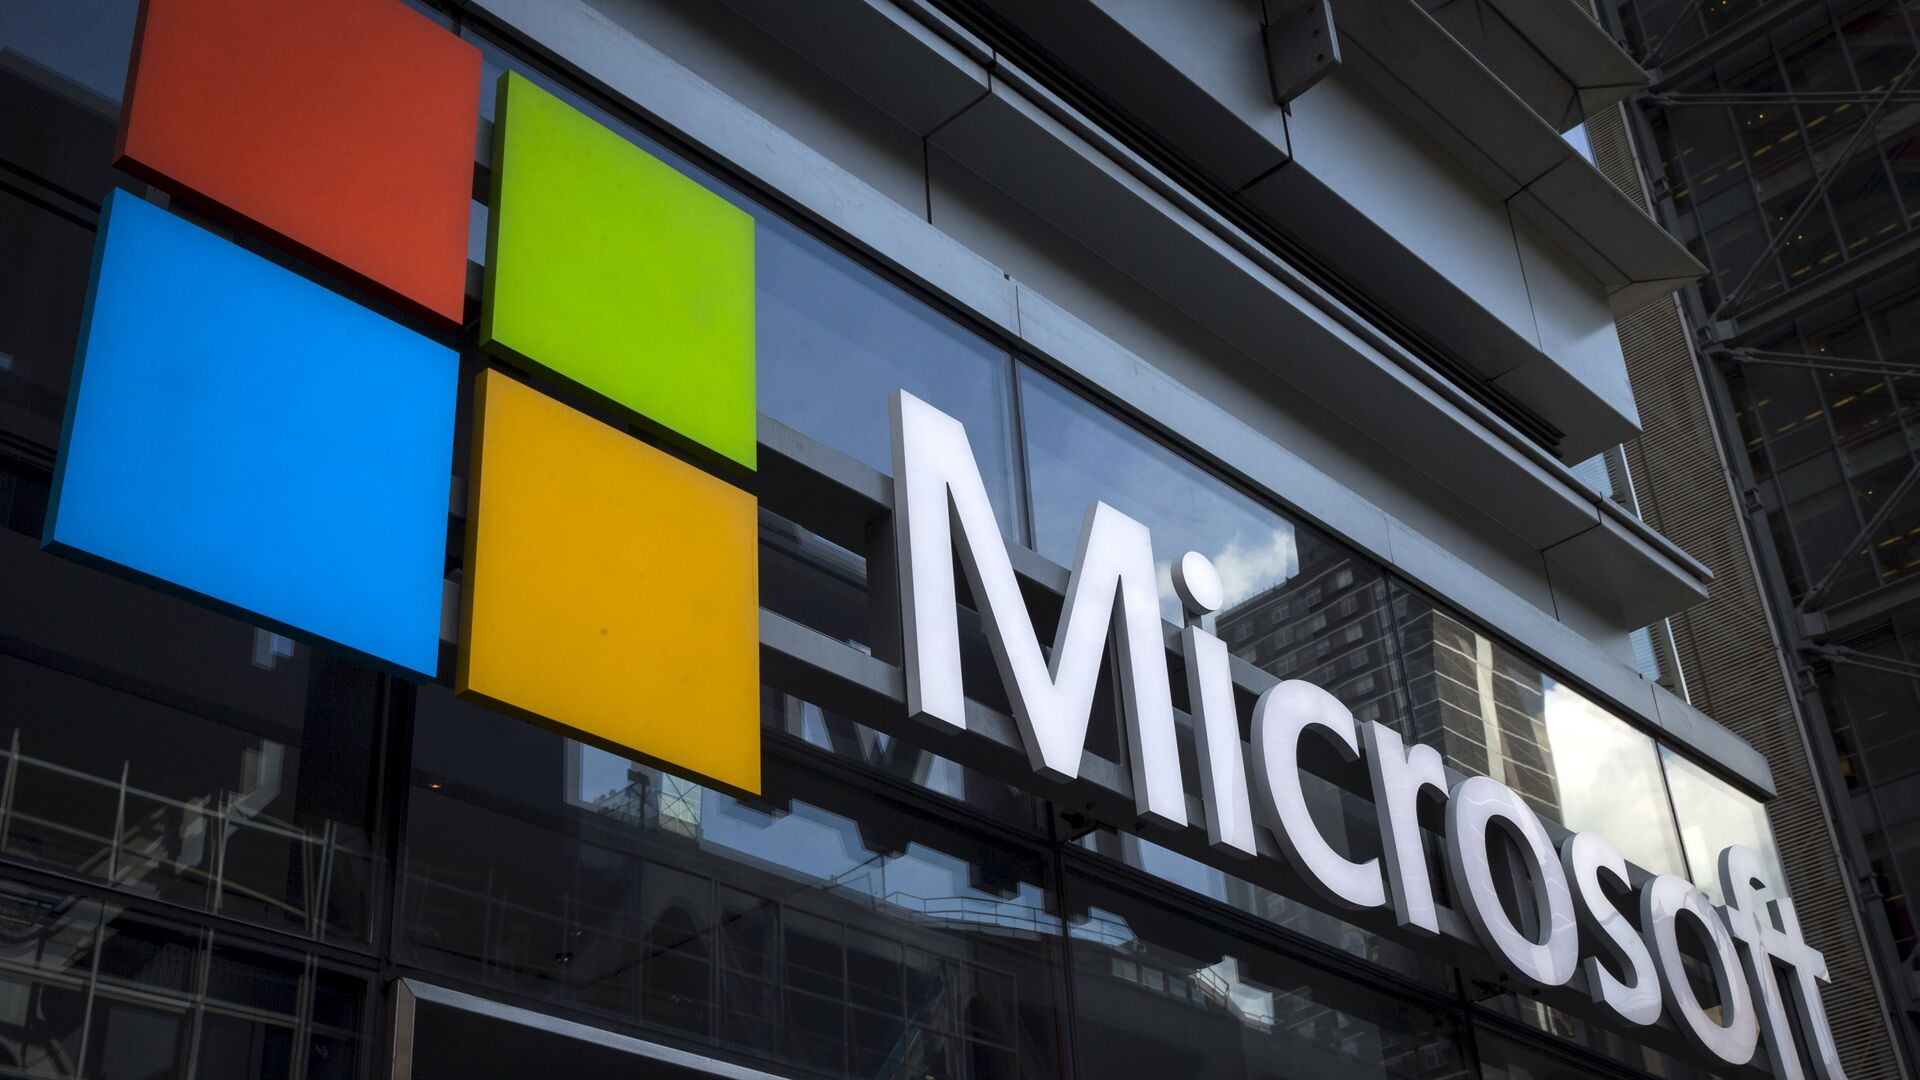 A Microsoft logo is seen on an office building in New York City, July 28, 2015 - Sputnik Mundo, 1920, 24.02.2021